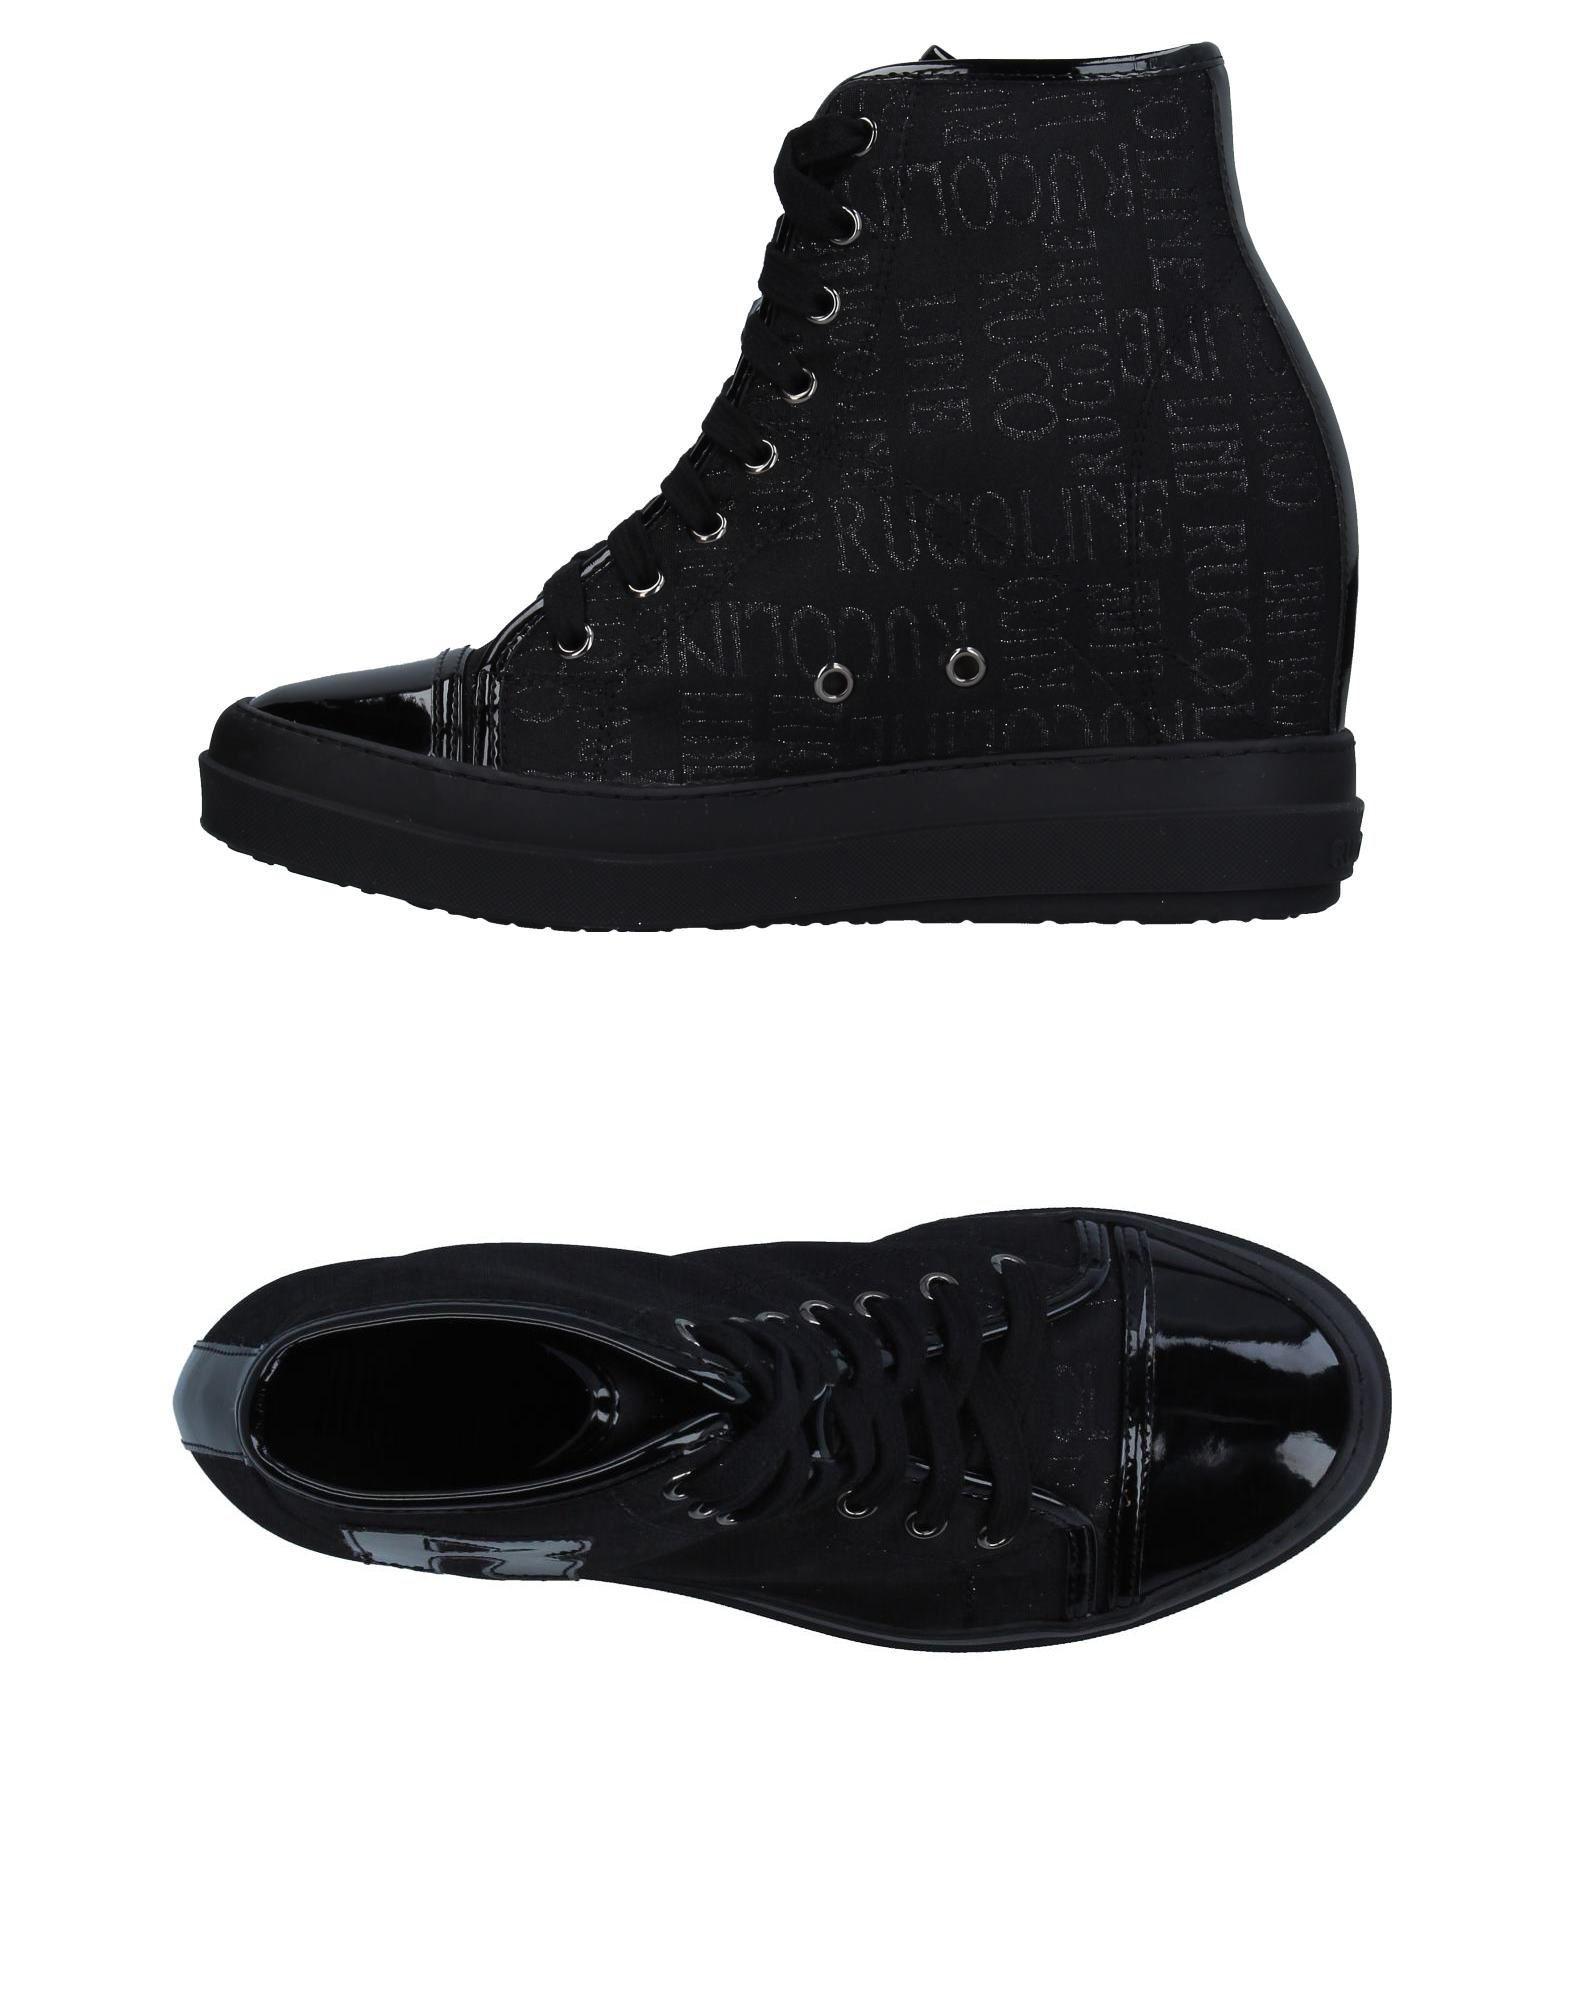 Ruco Line Sneakers Damen beliebte  11333498WR Gute Qualität beliebte Damen Schuhe 35af93